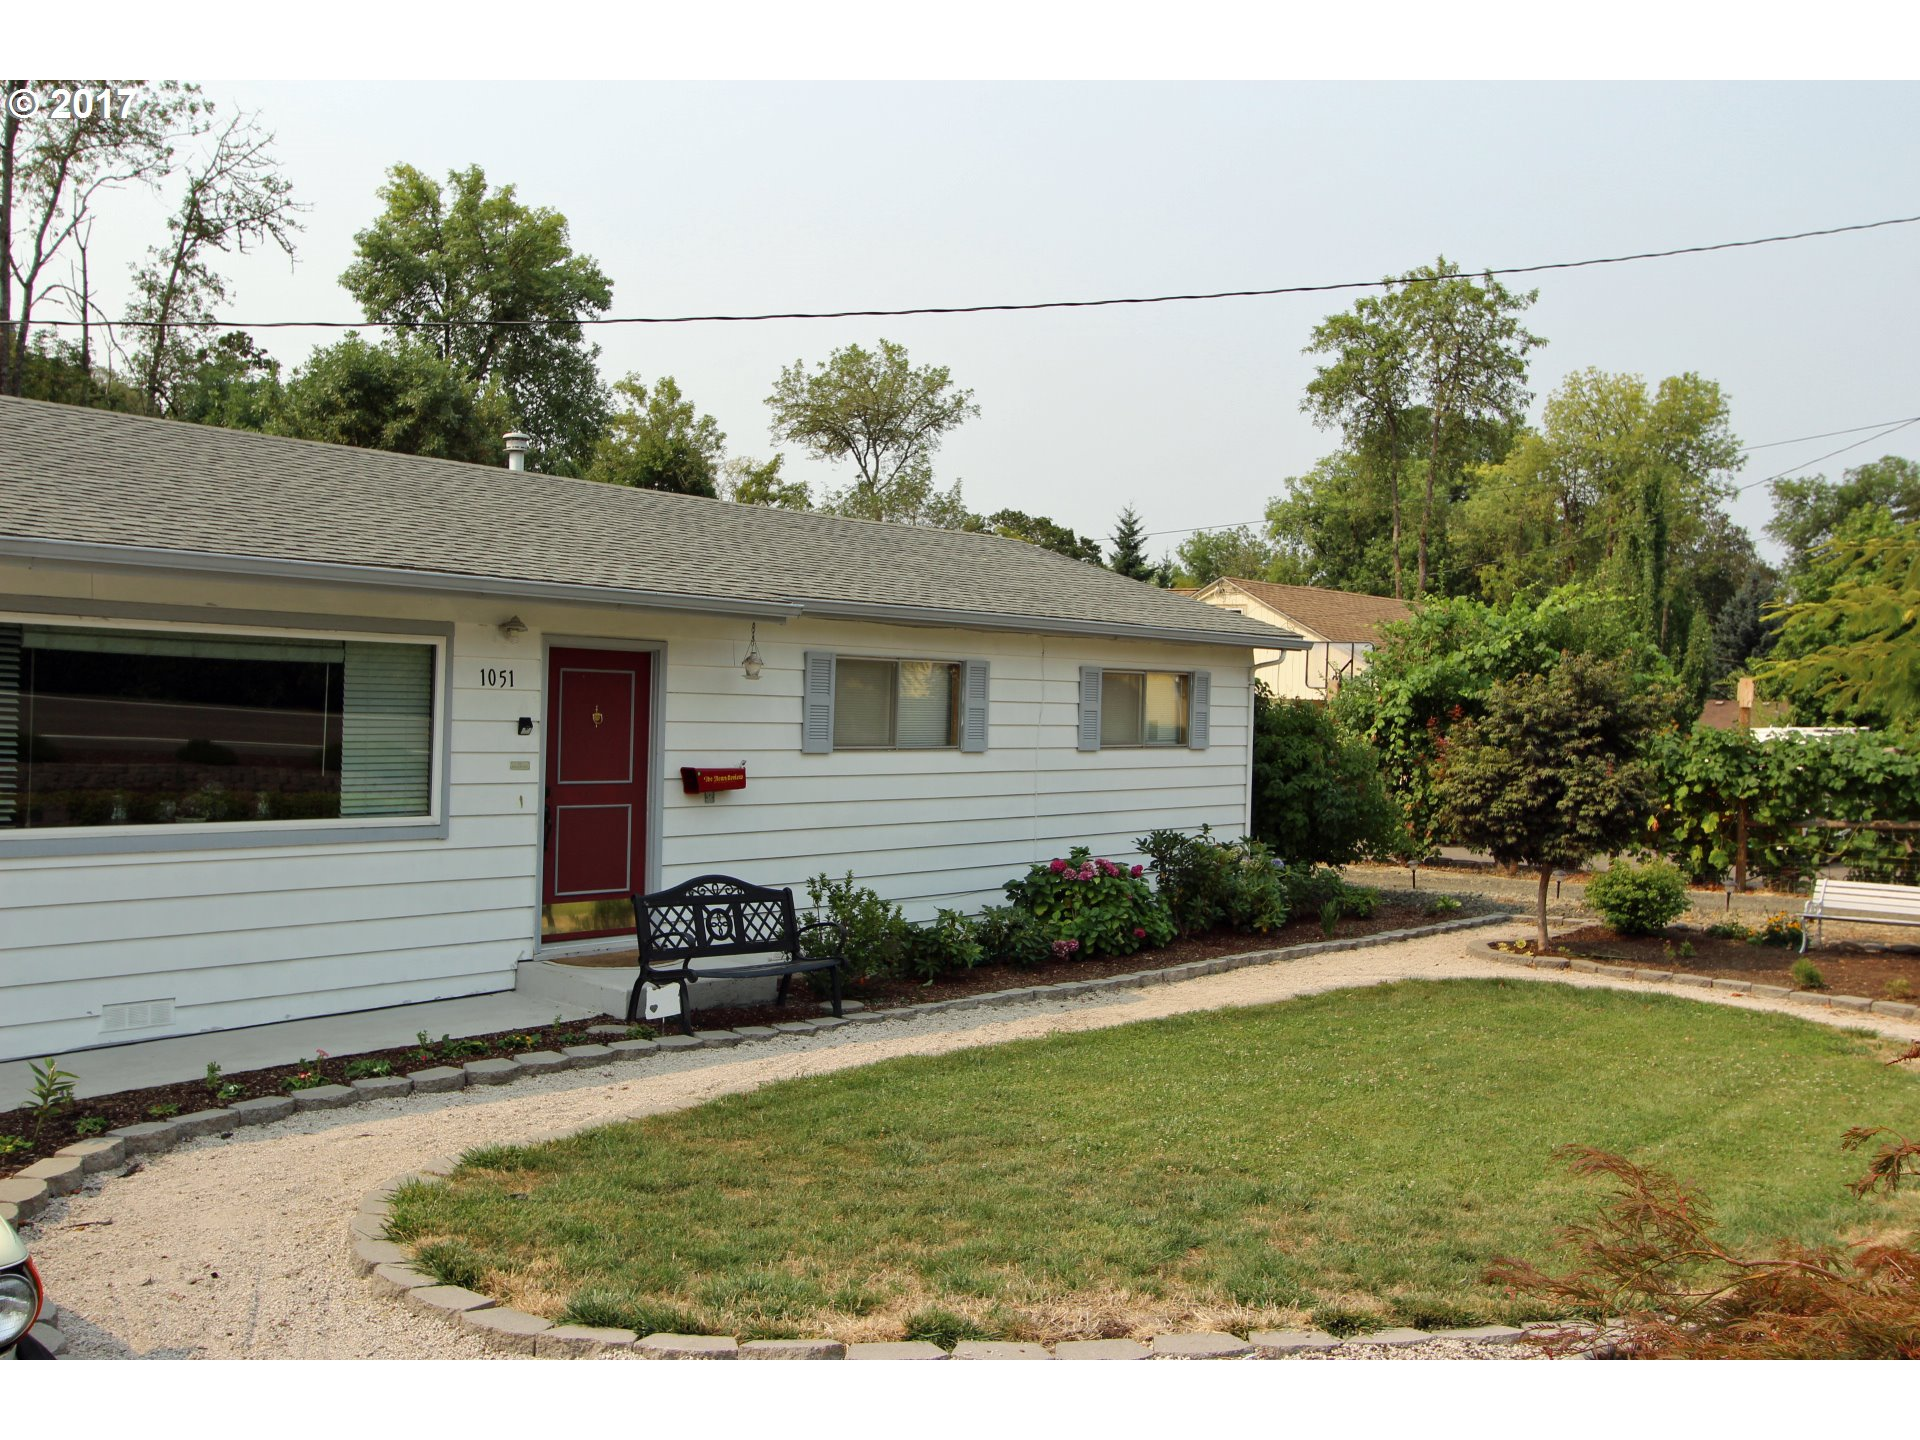 1051 NE NEWTON CREEK DR, Roseburg, OR 97470